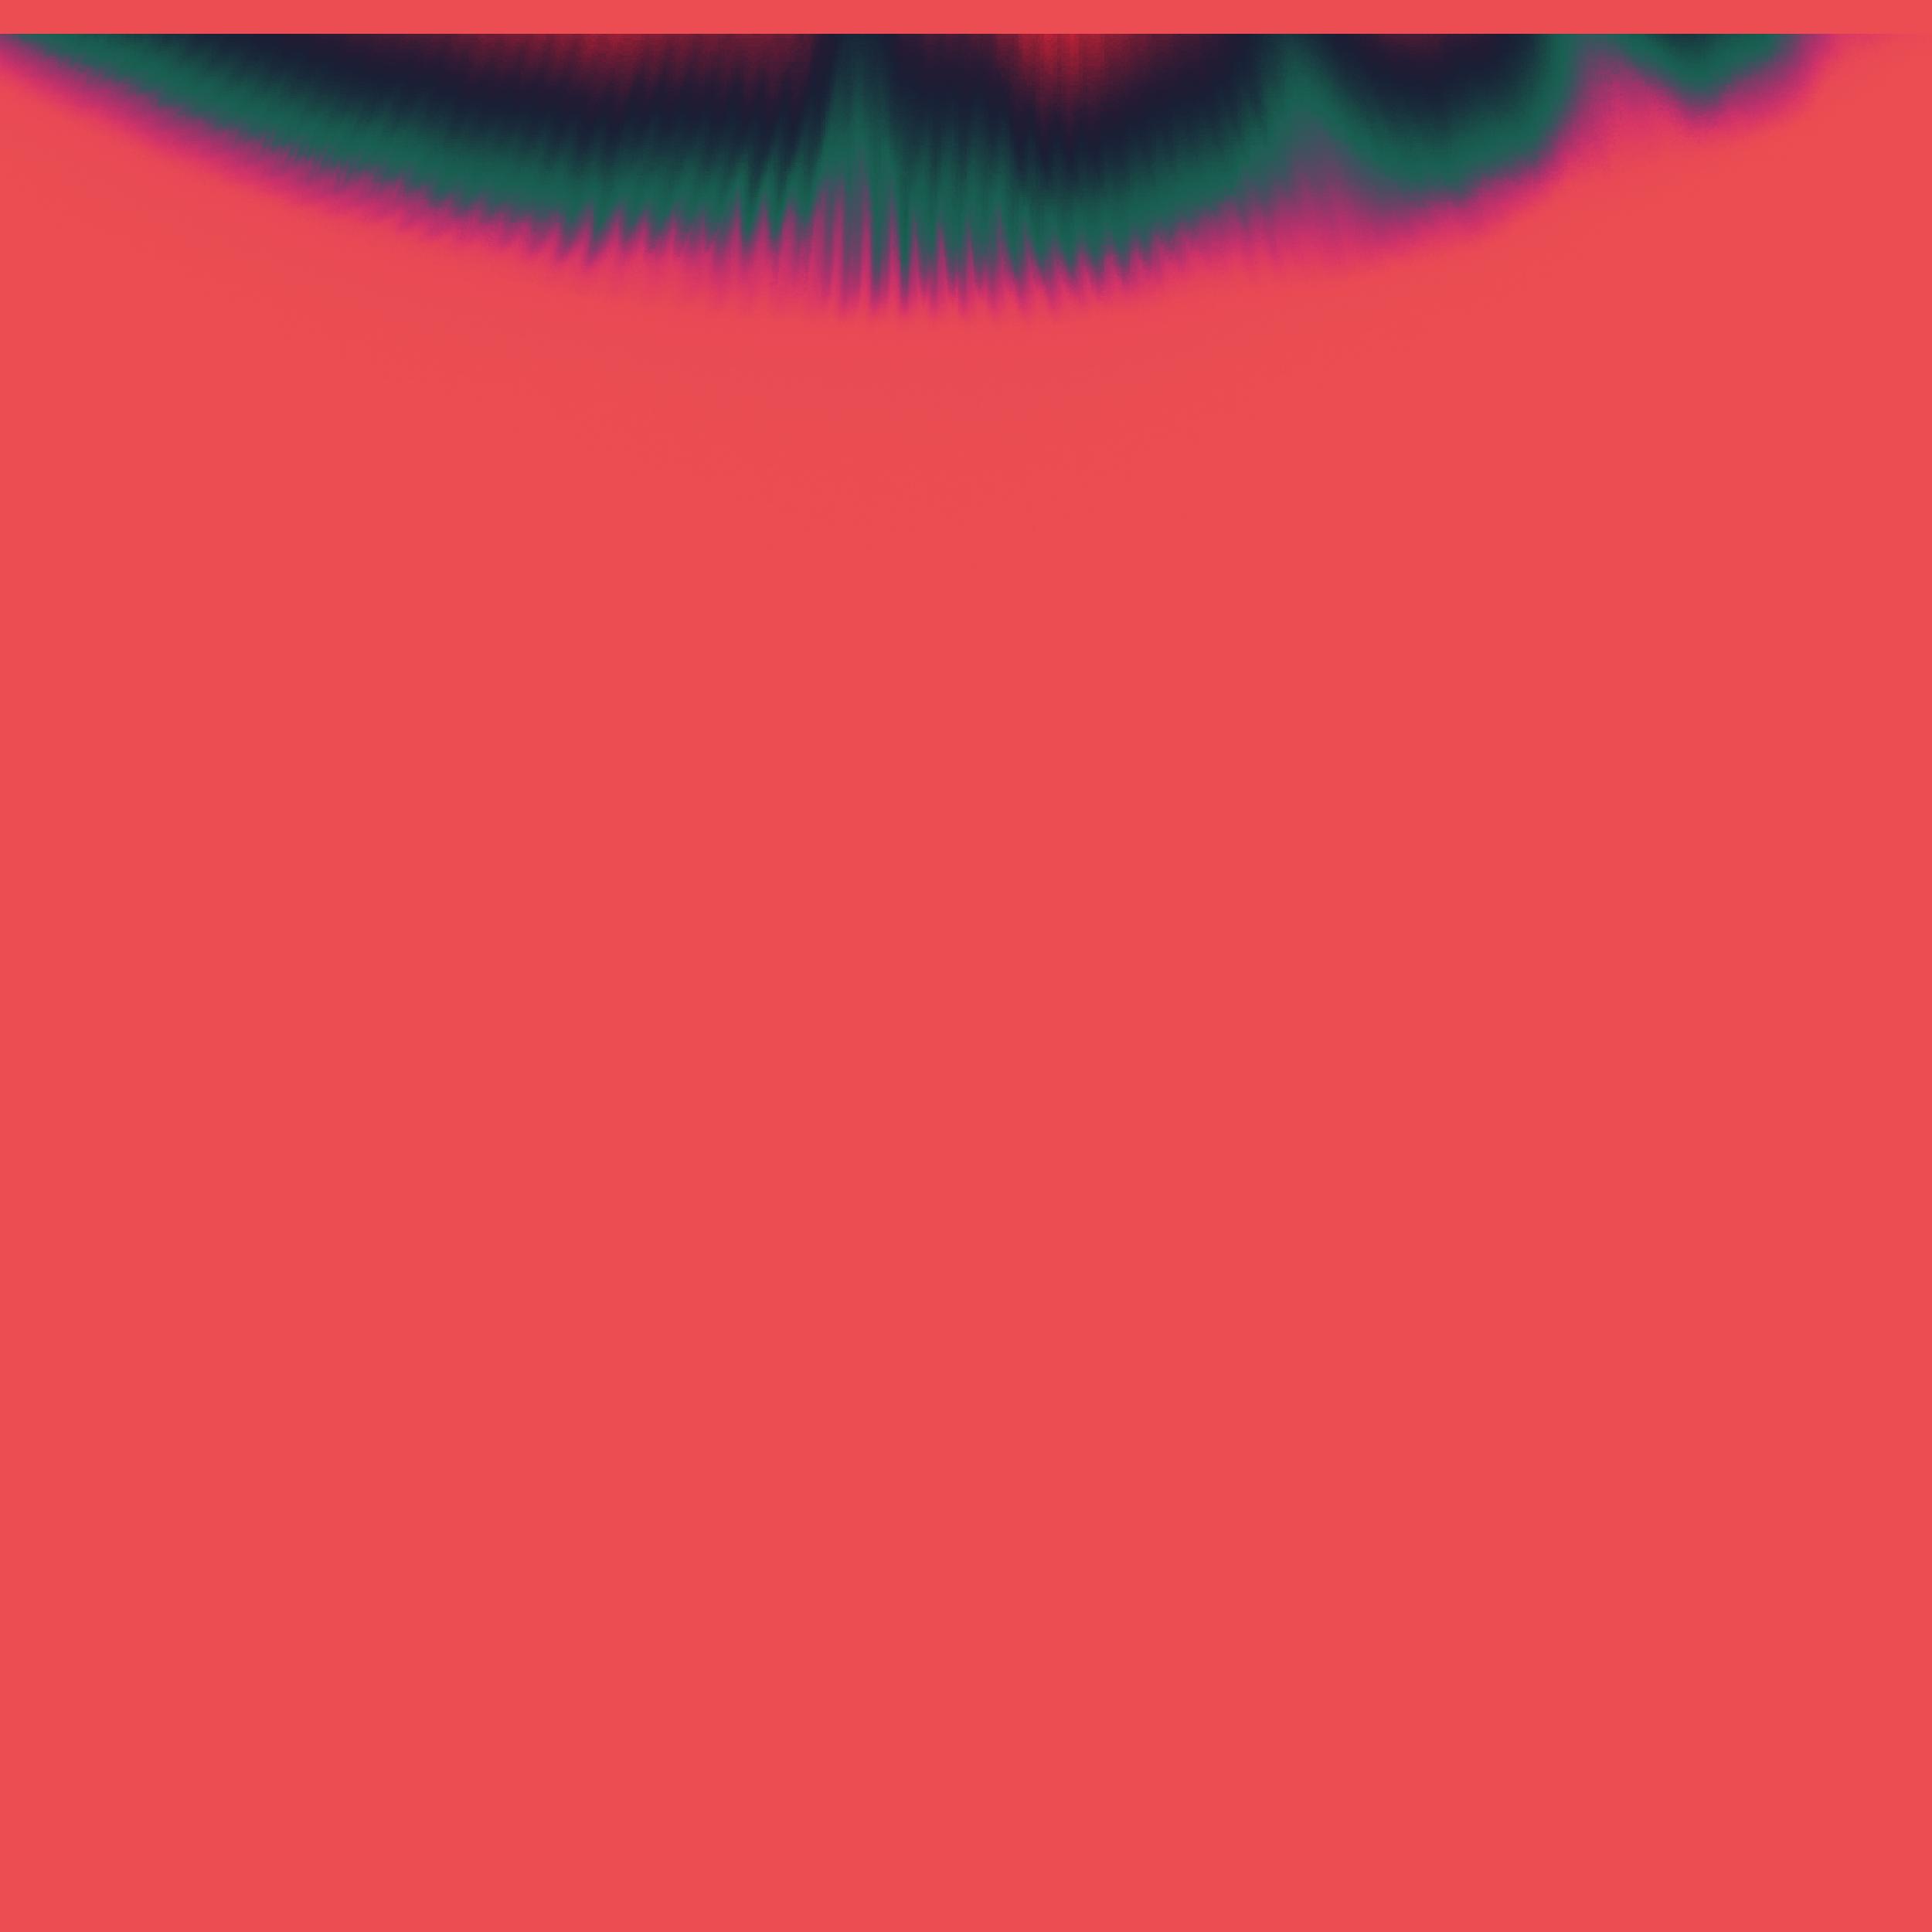 BACK_ColorField_AlbumArt alt.png